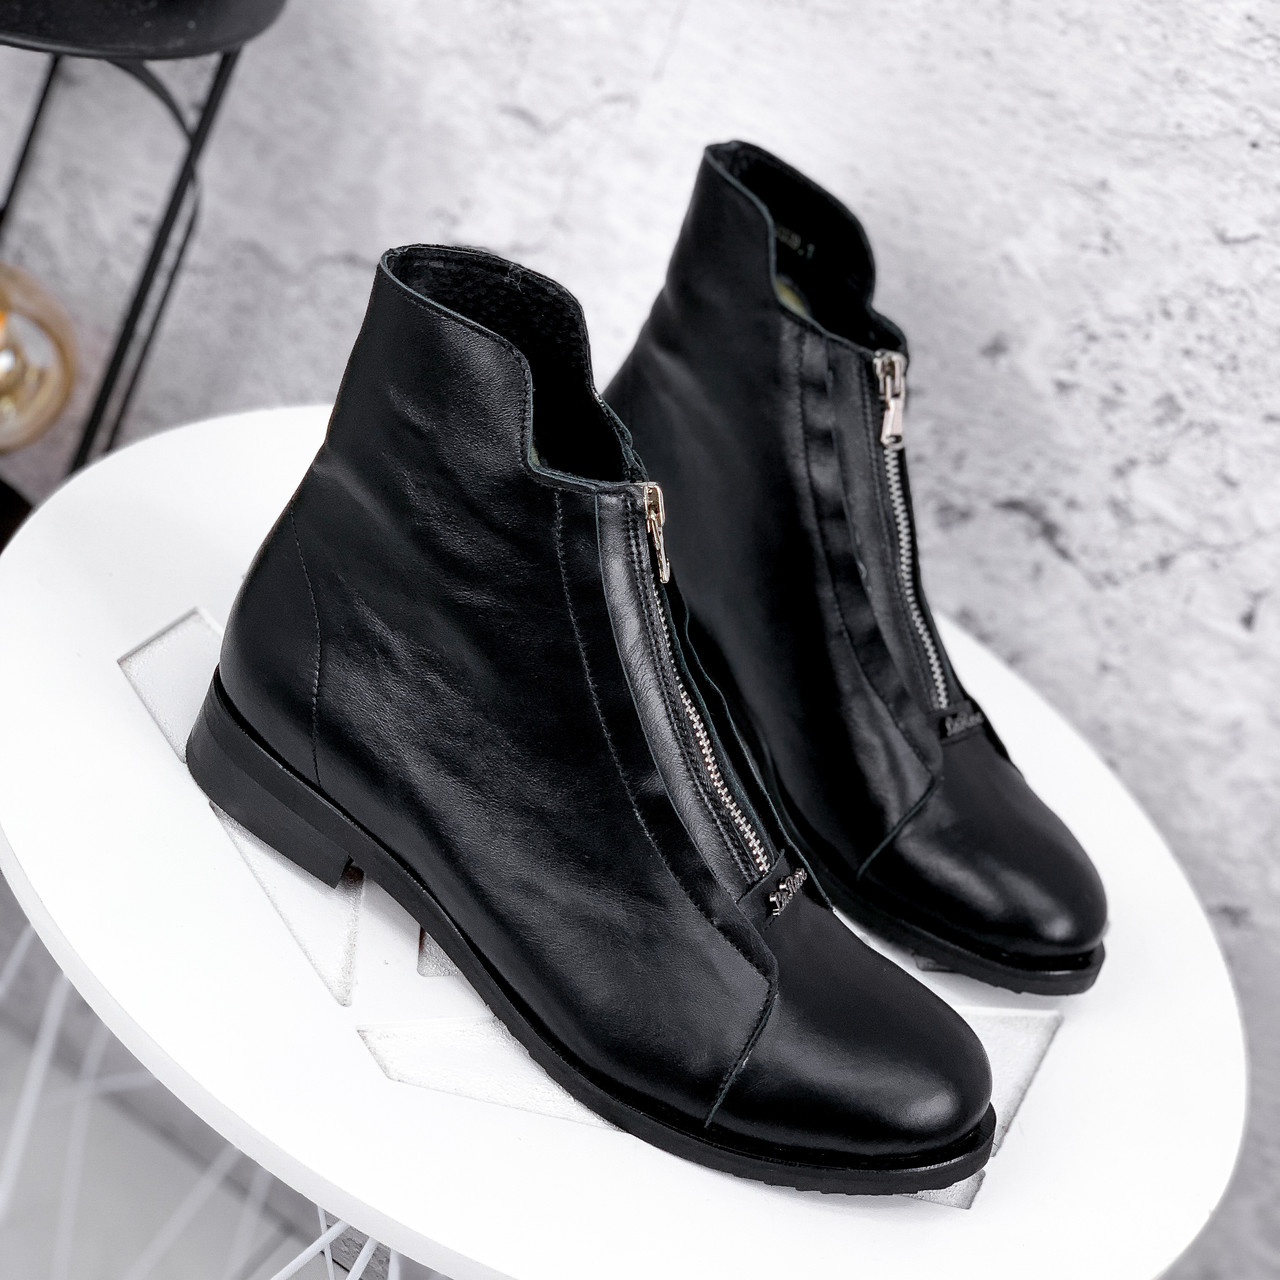 Ботинки женские Harry кожаные ЗИМА 2454